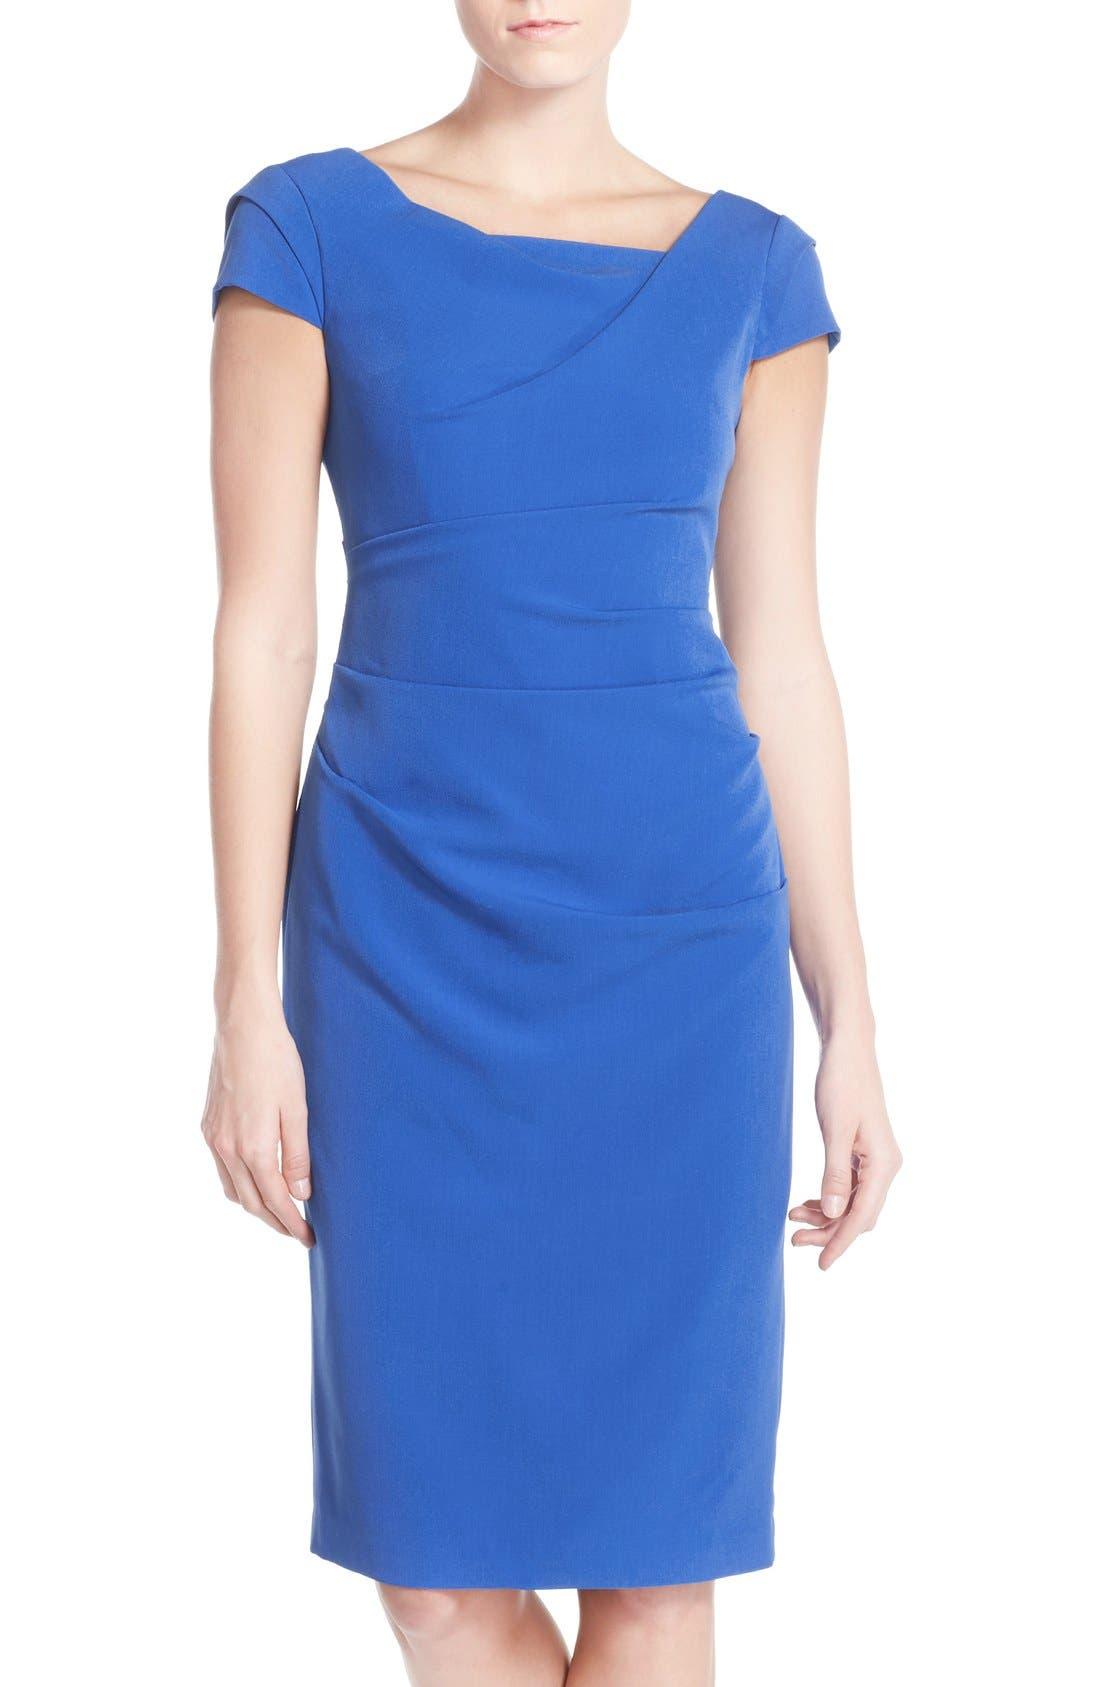 Ruched Matte Stretch Crepe Sheath Dress,                             Main thumbnail 1, color,                             433